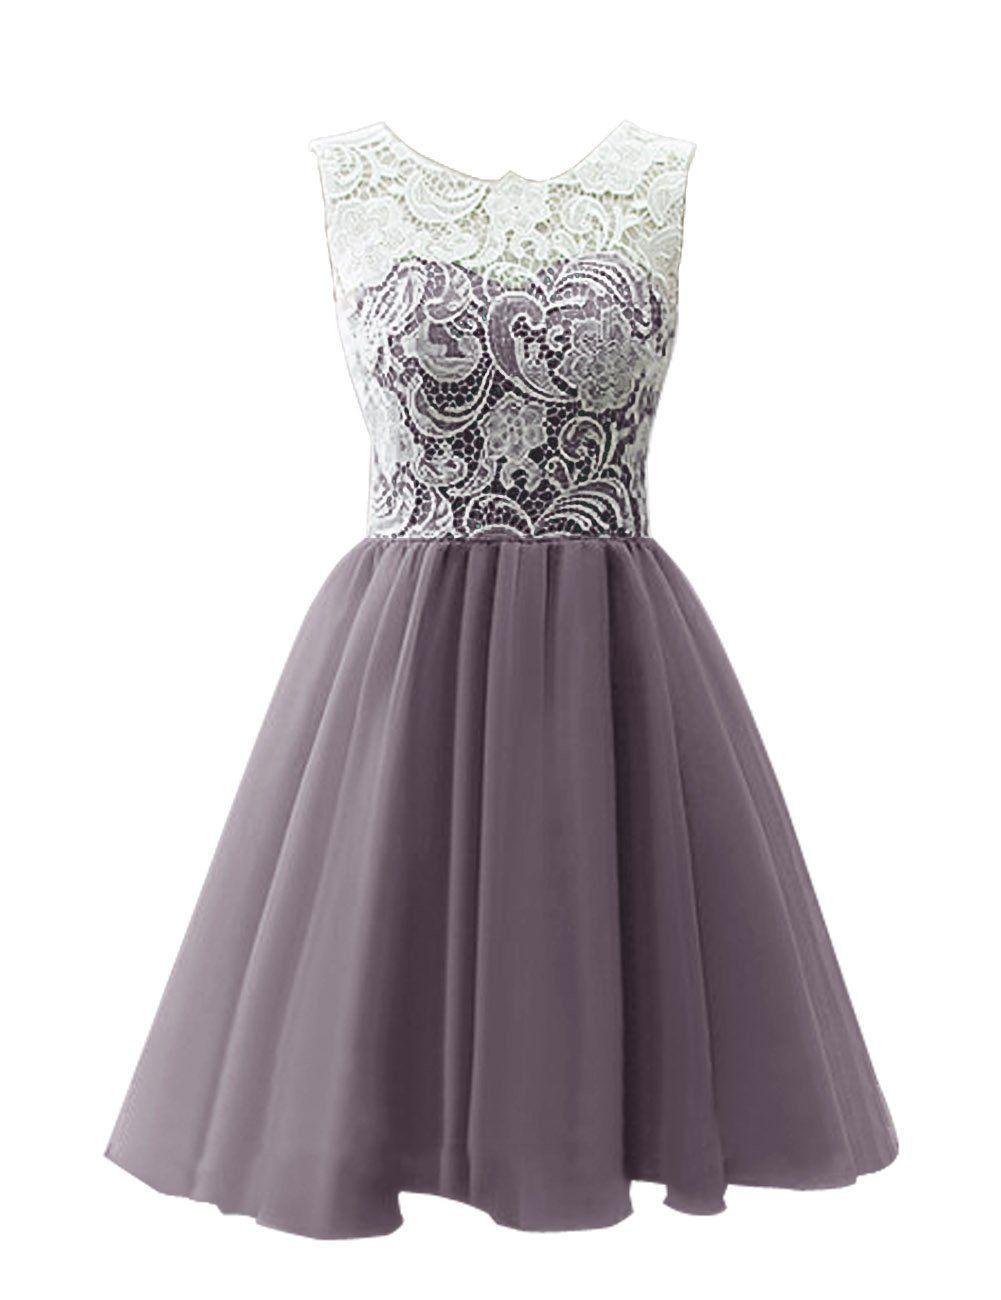 17 Spektakulär Kleid Grau Rosa Bester Preis Coolste Kleid Grau Rosa Boutique